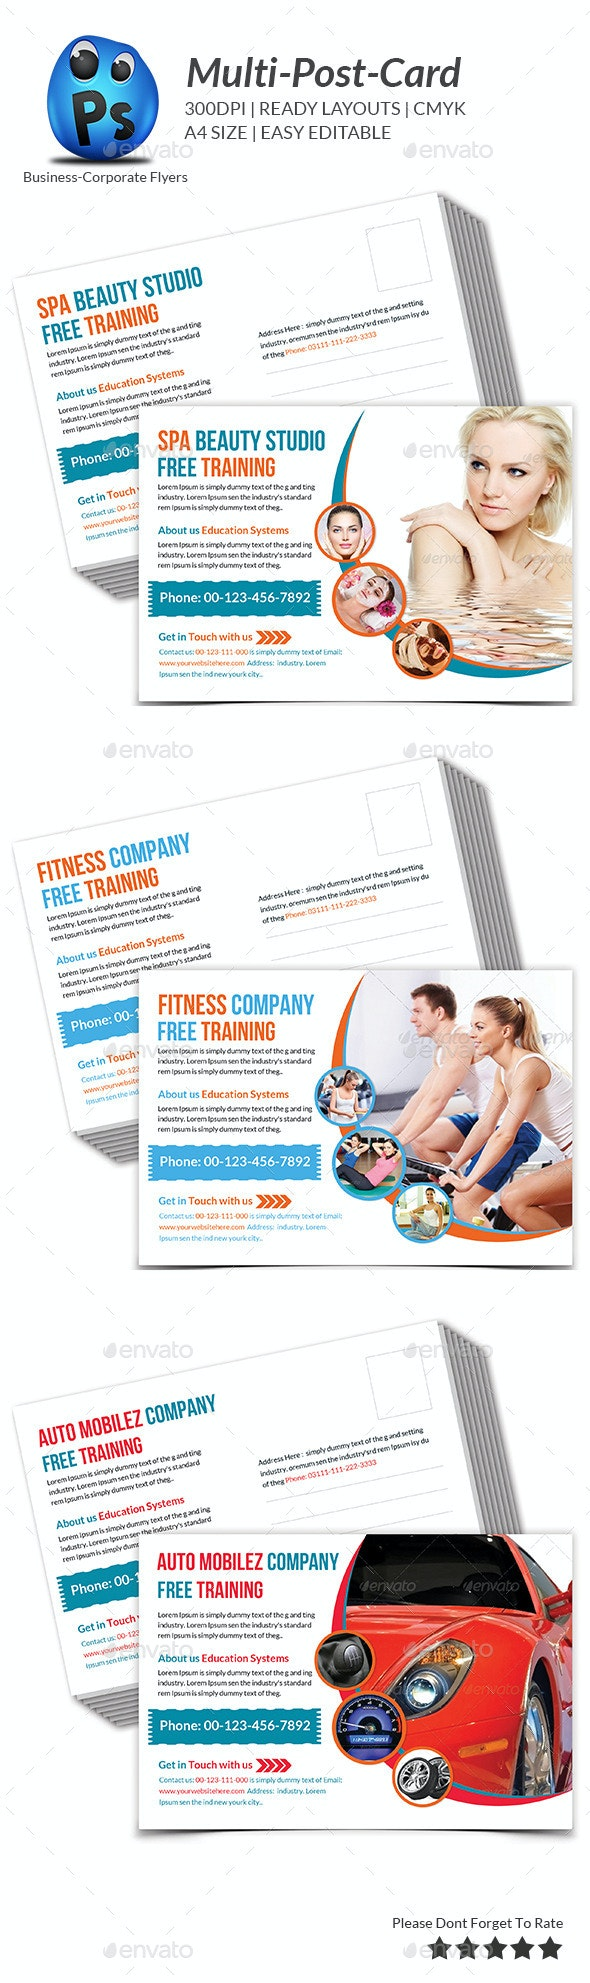 Multipurpose Business Postcard Template - Cards & Invites Print Templates